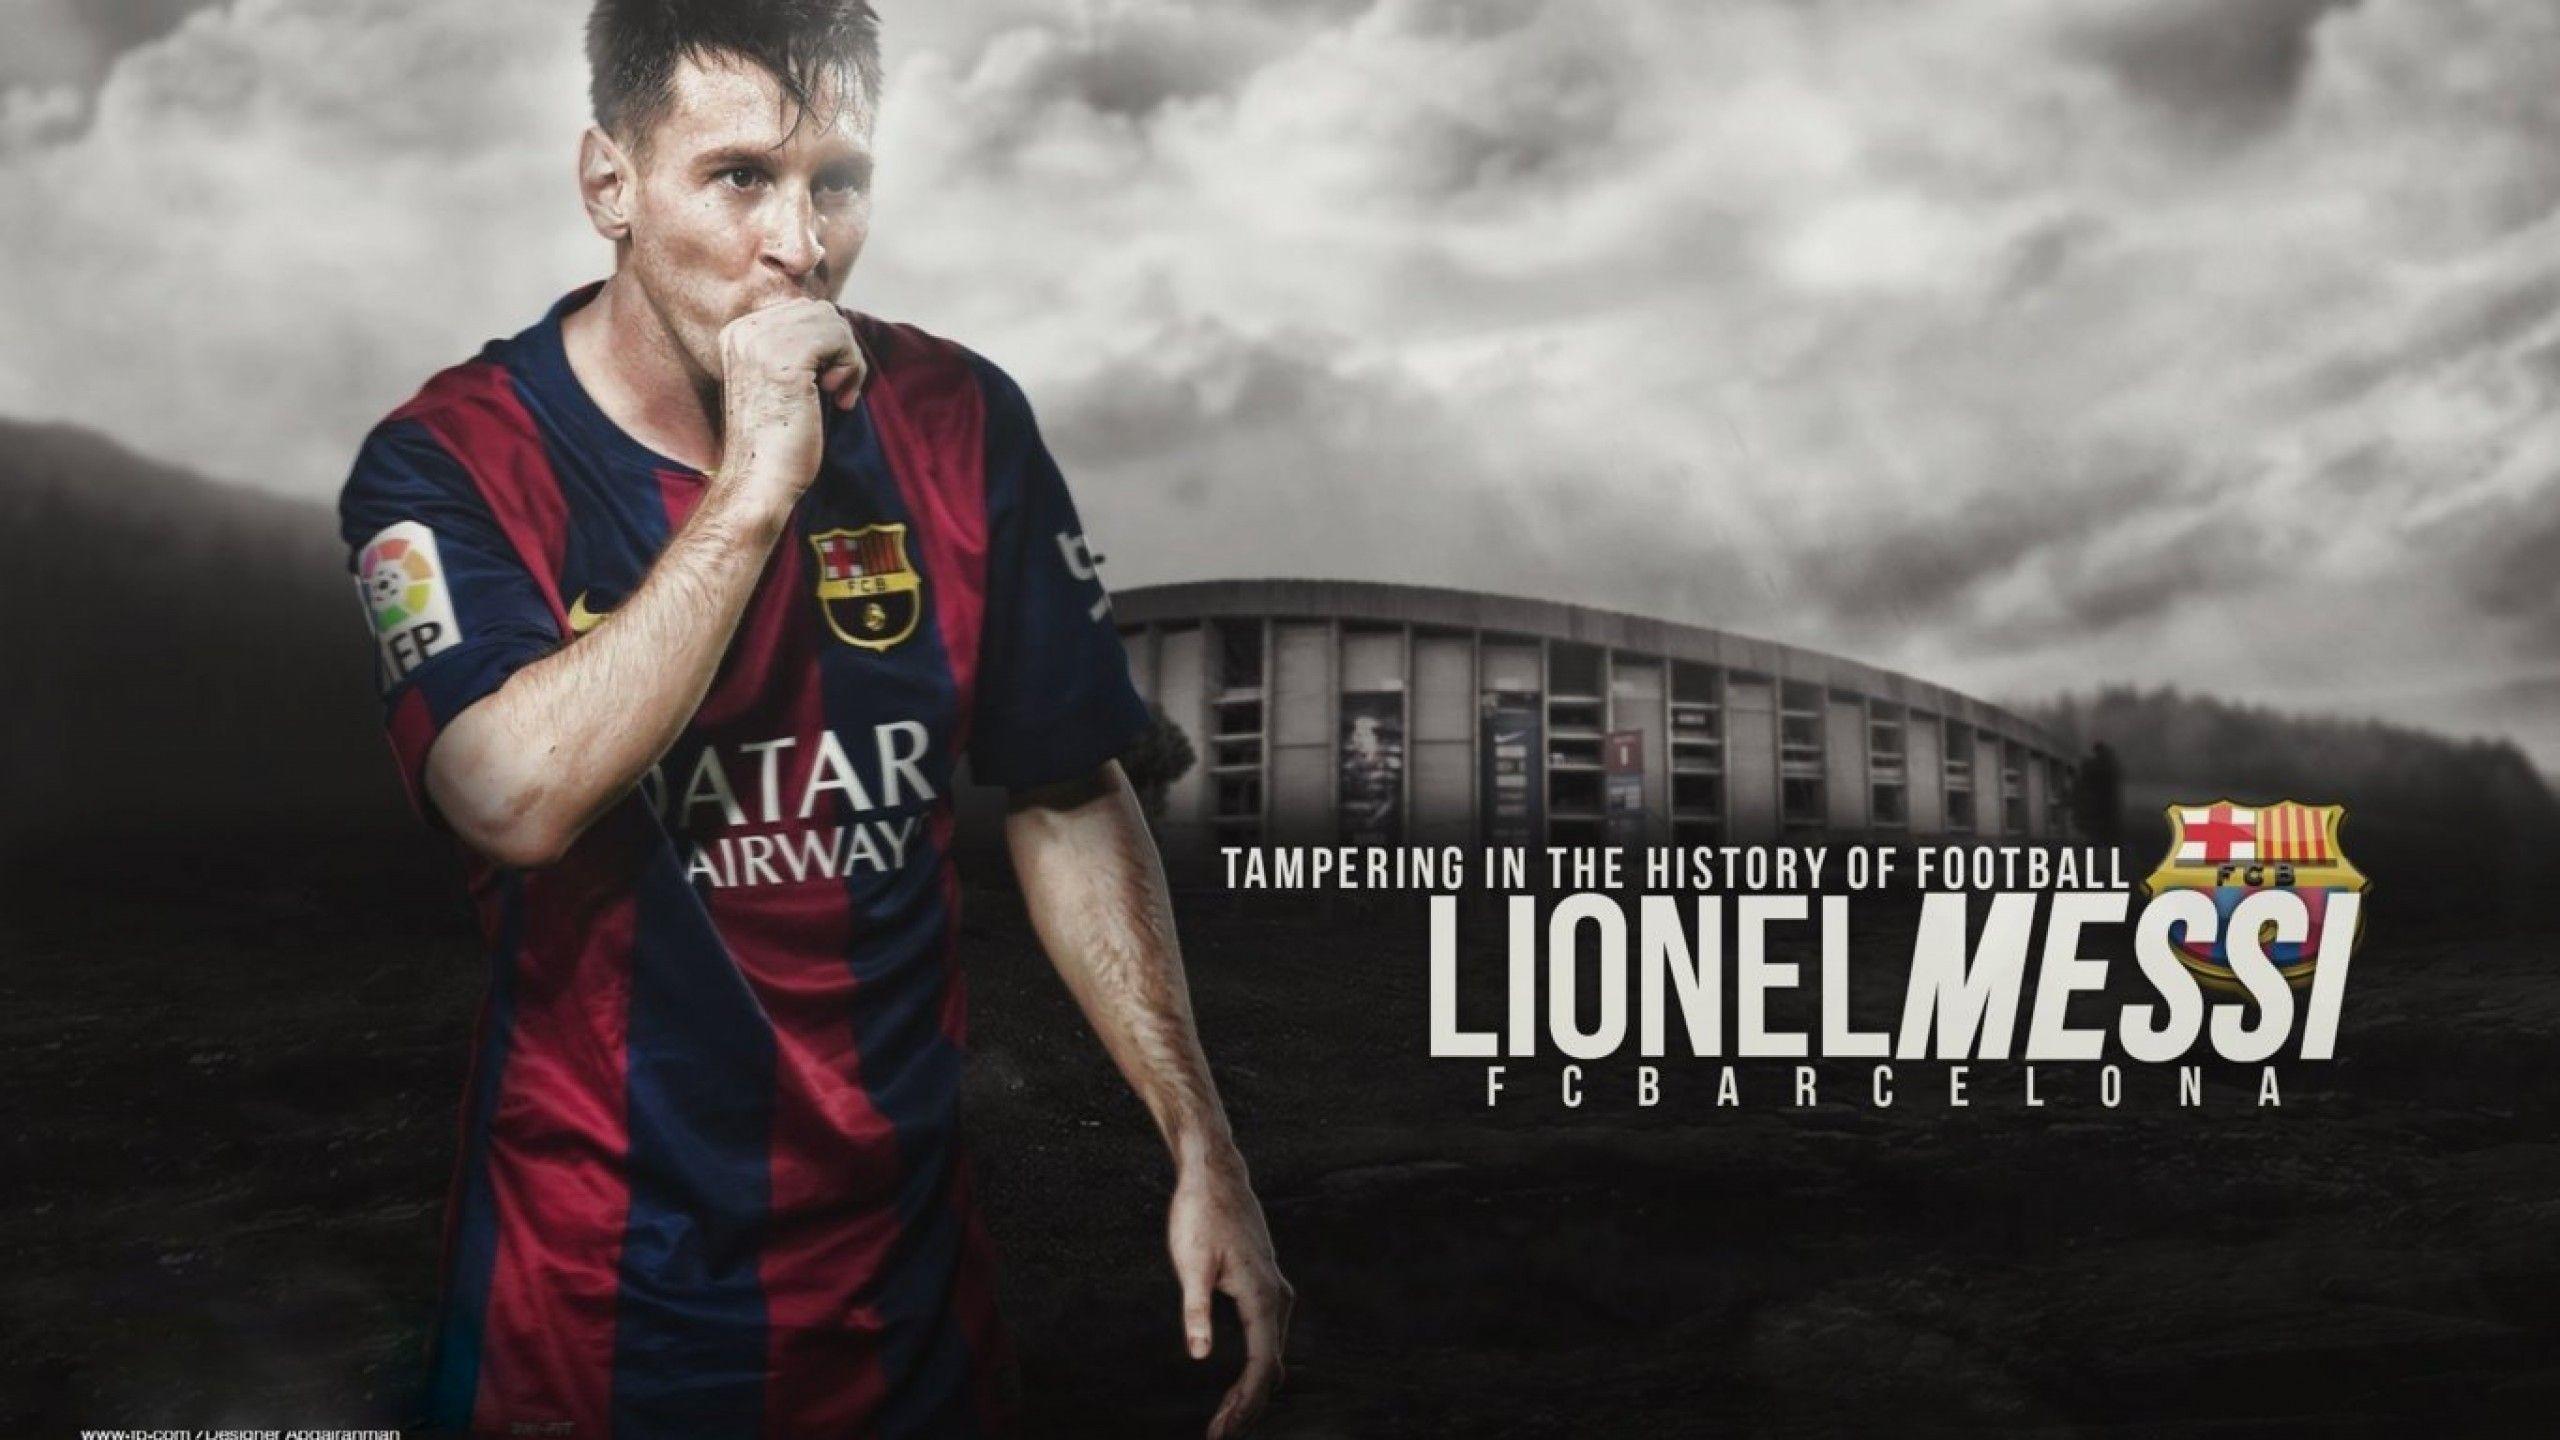 Lionel Messi 2018 Wallpaper Hd 1080p ①